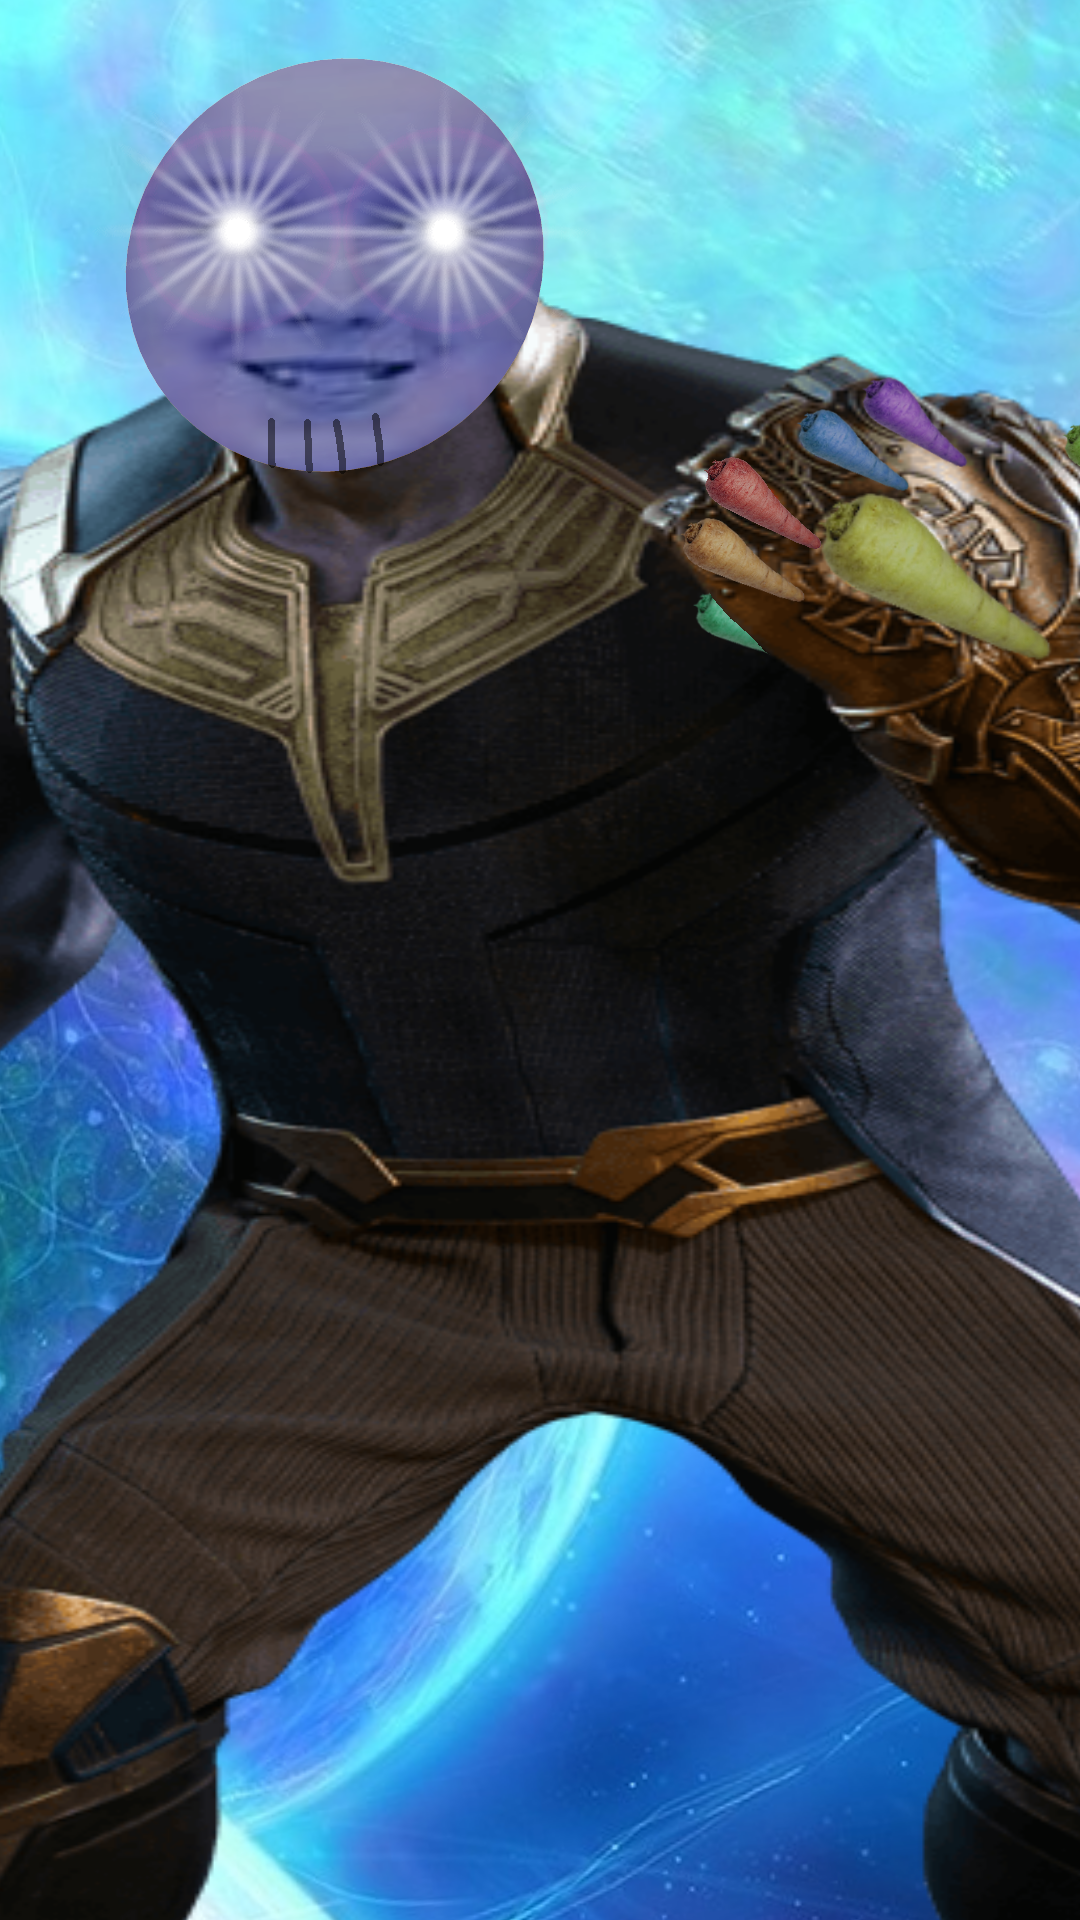 Thicc Boi Thanos The Club Chronicles Wiki Fandom